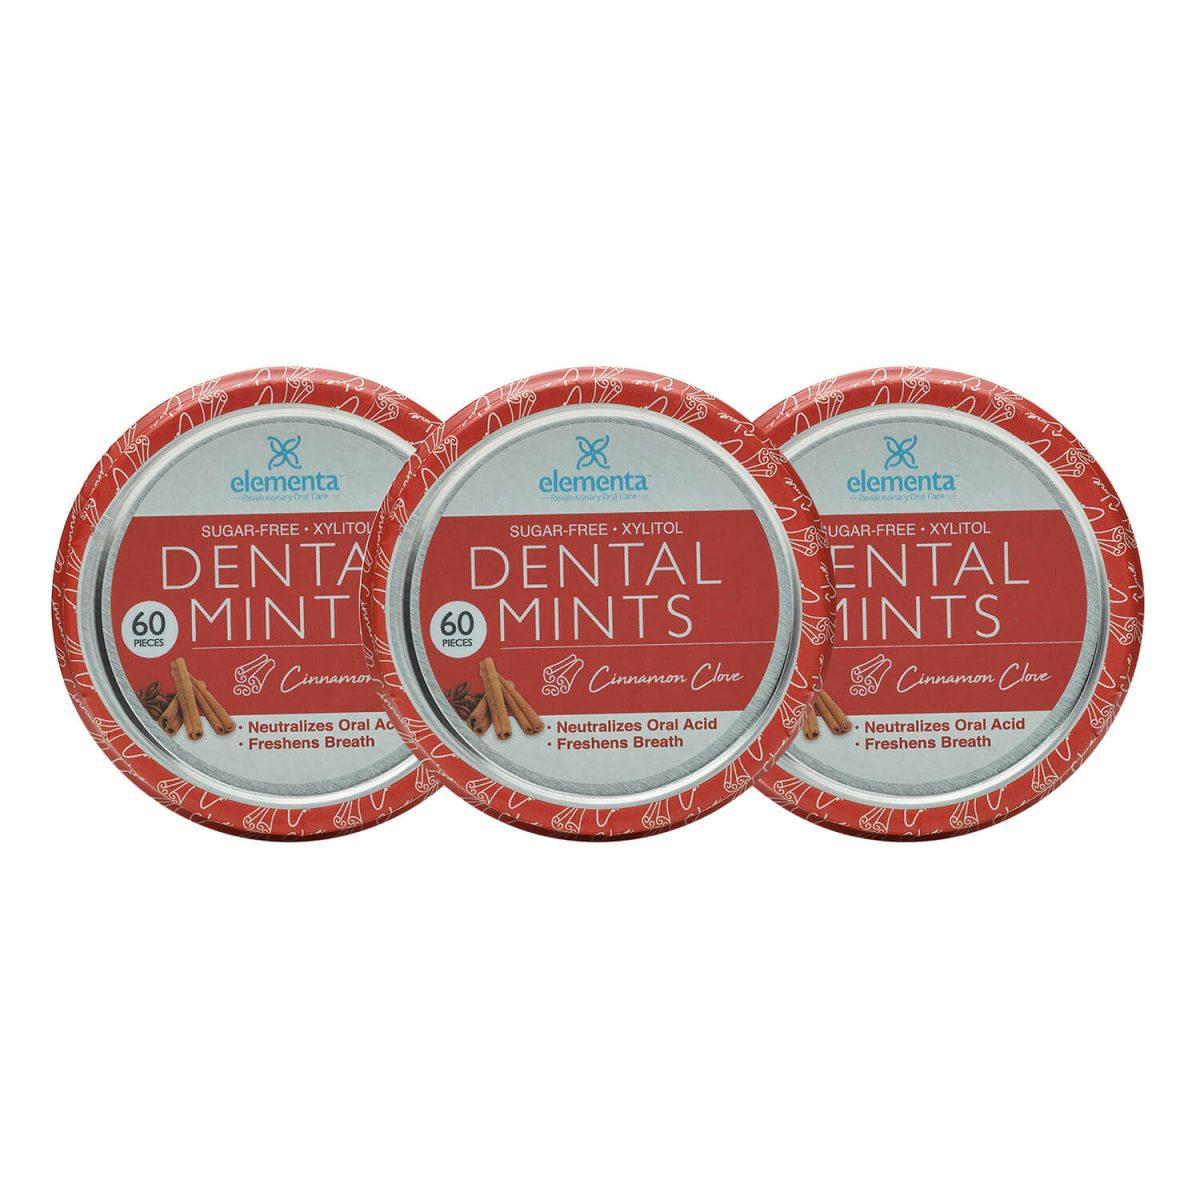 nano silver dental mints cinnamon clove 3 pack